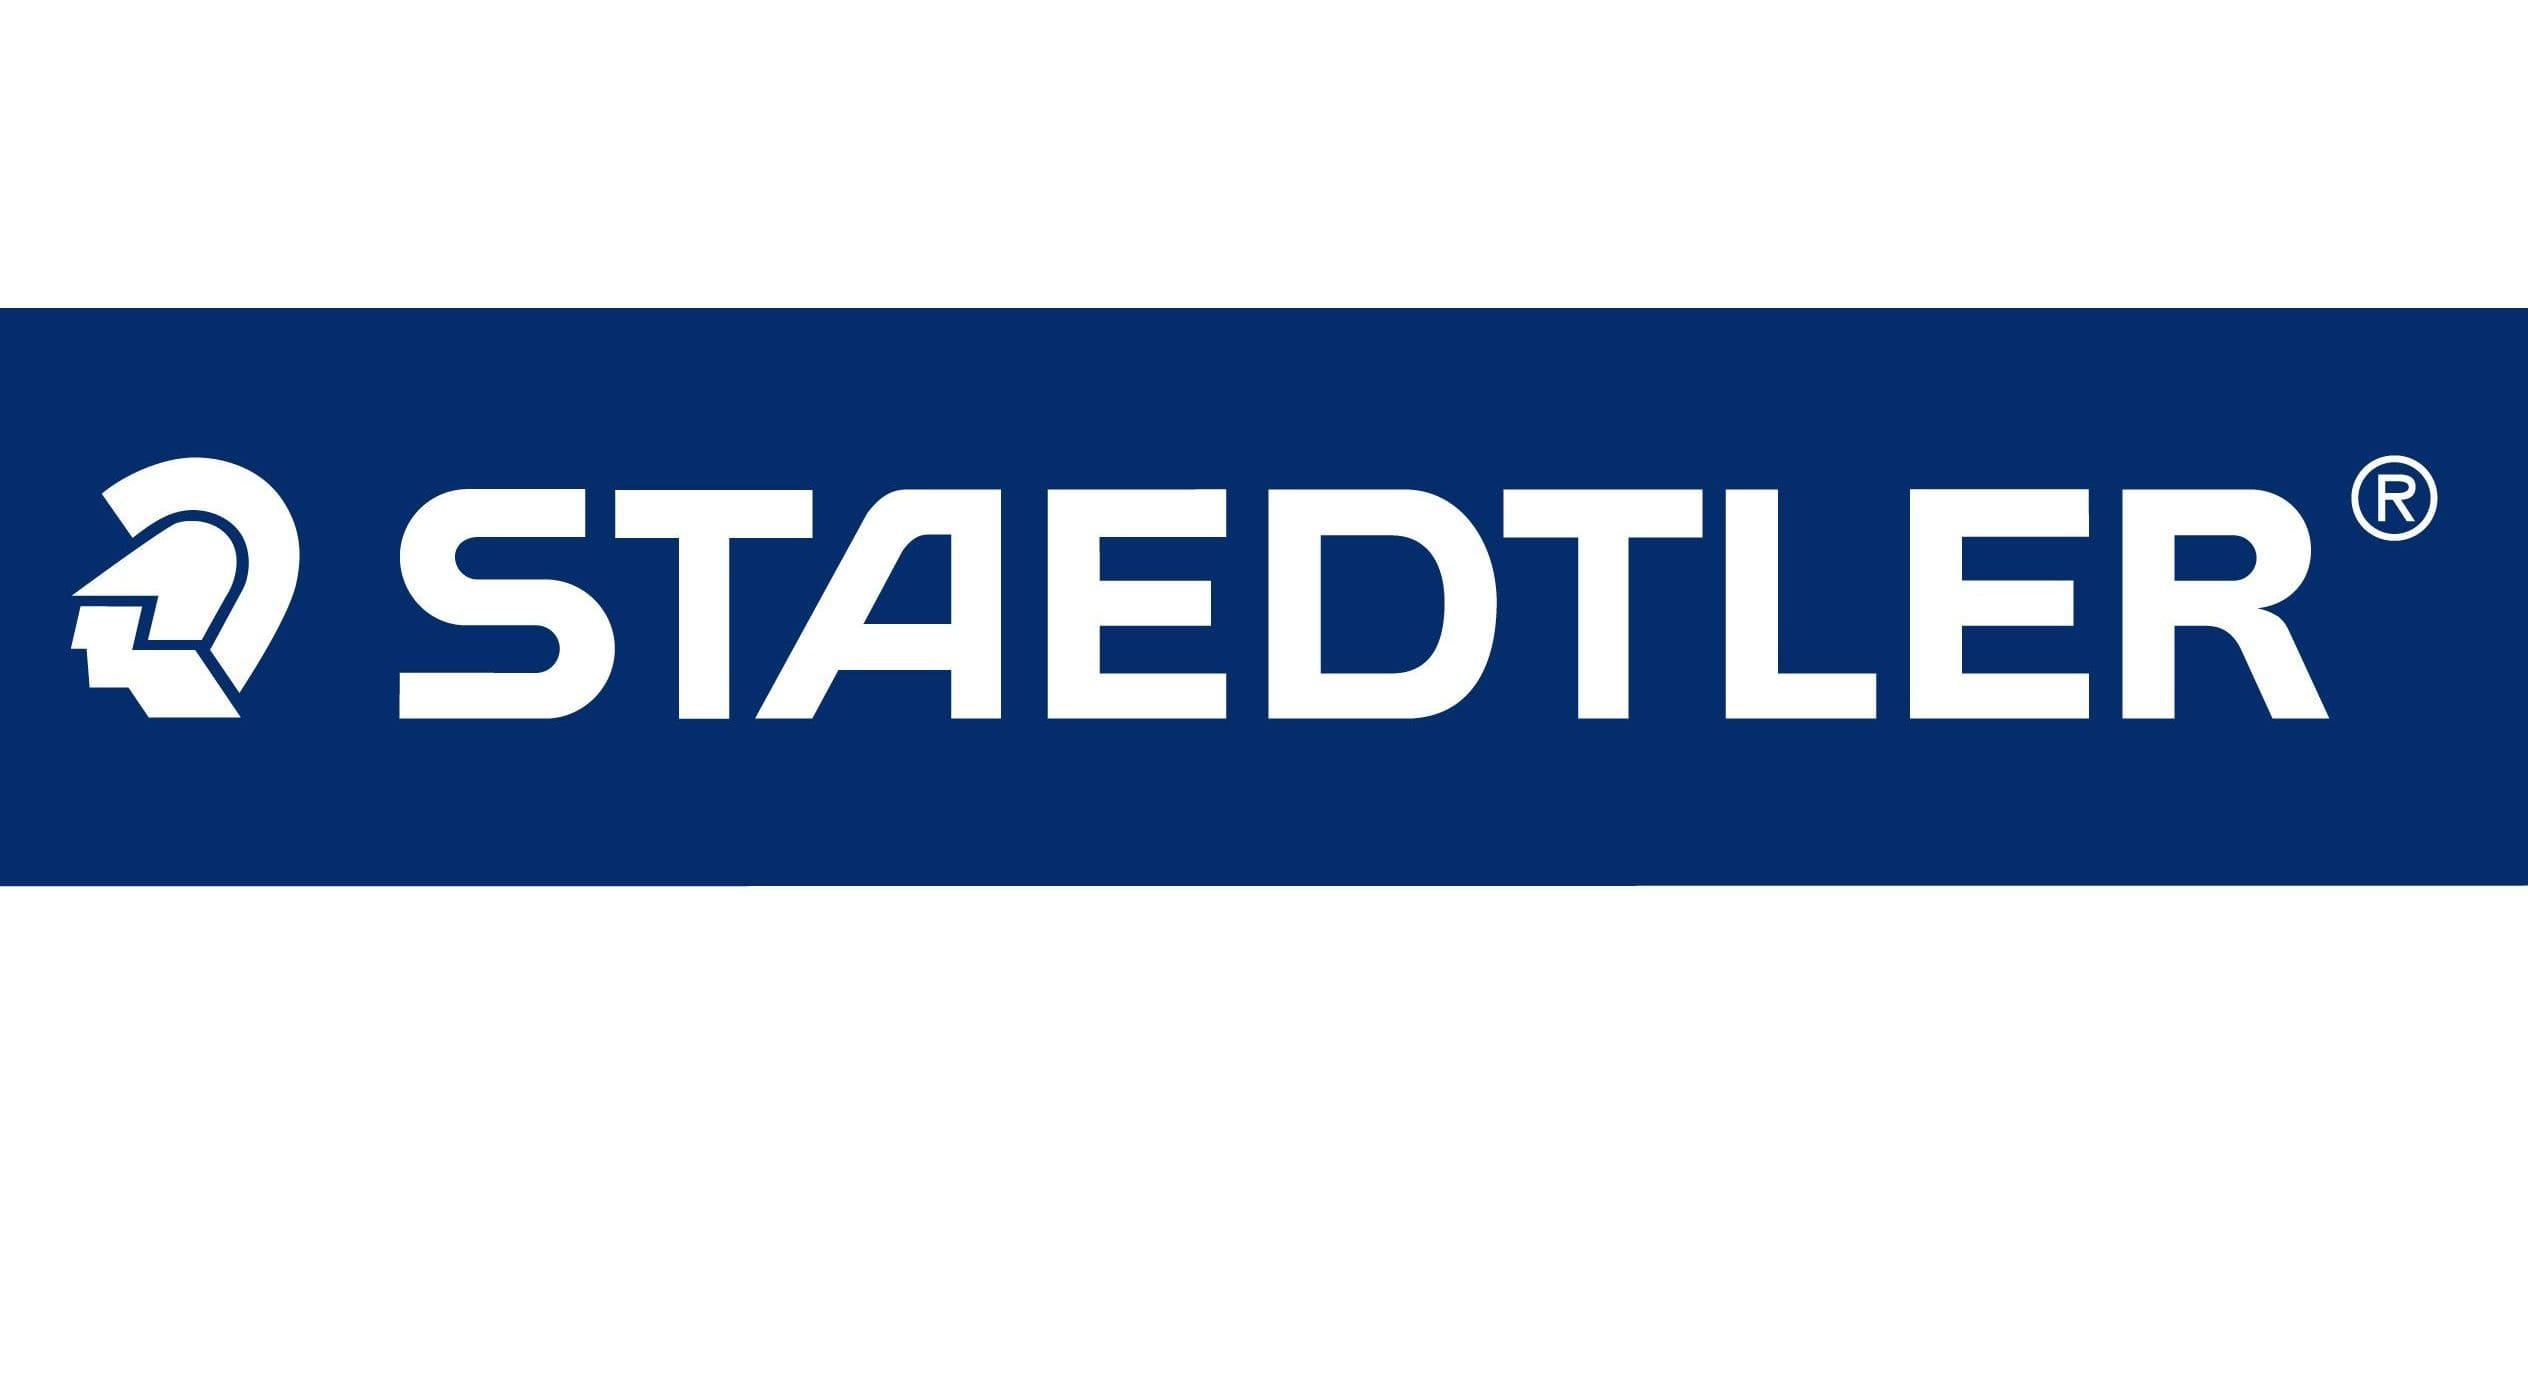 Staedtler Logo | evolution history and meaning, PNG